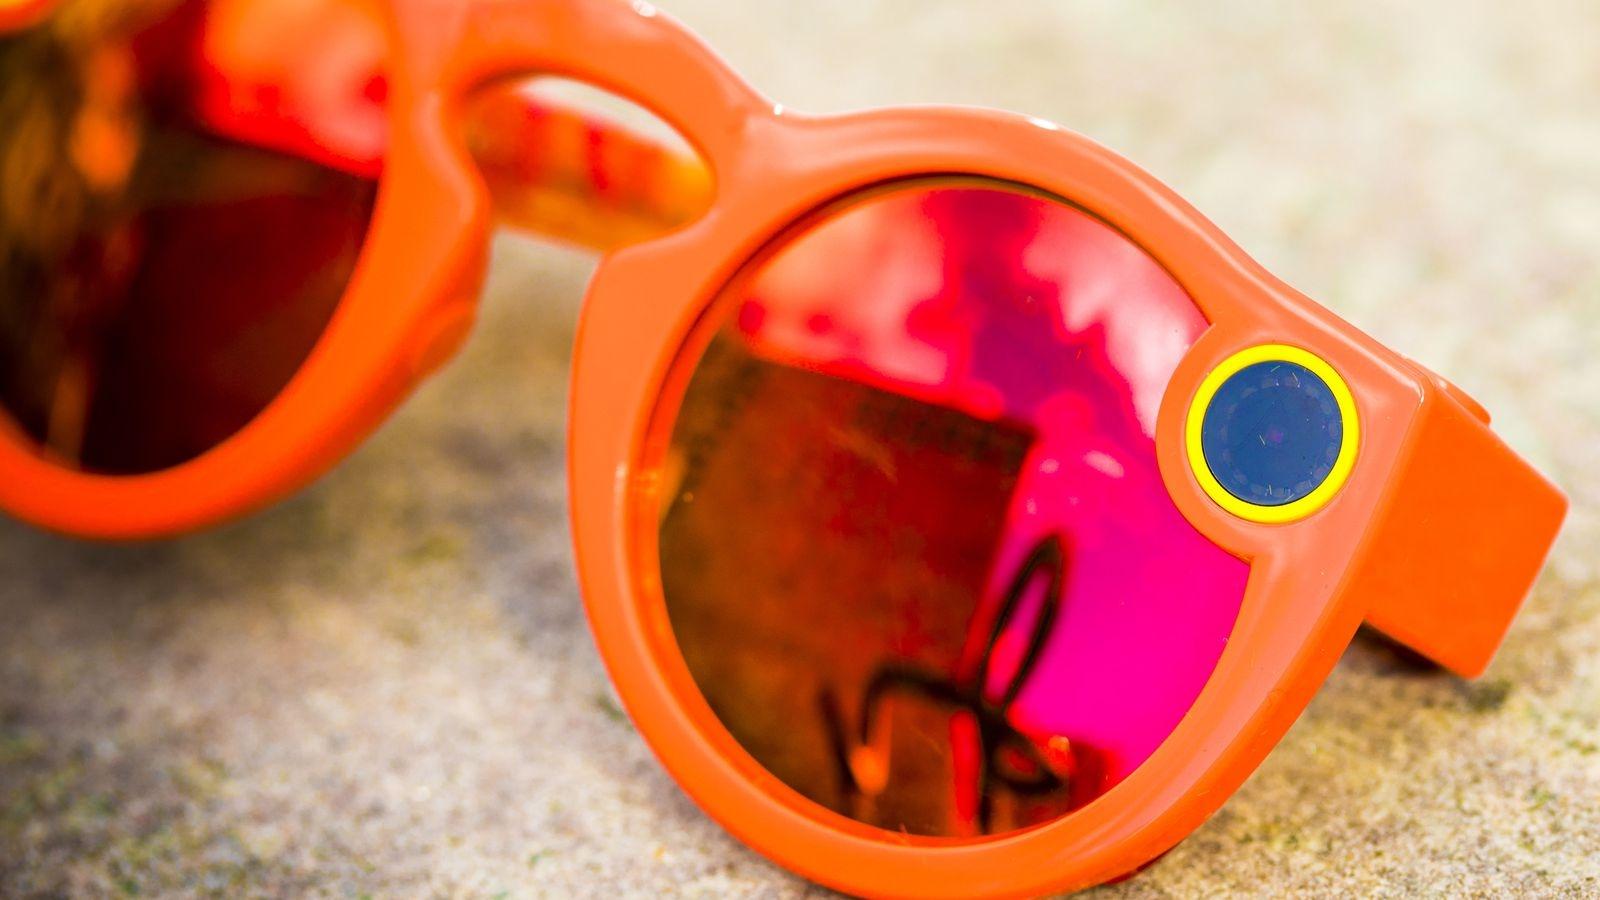 snapchat-spectacles-camera-6332